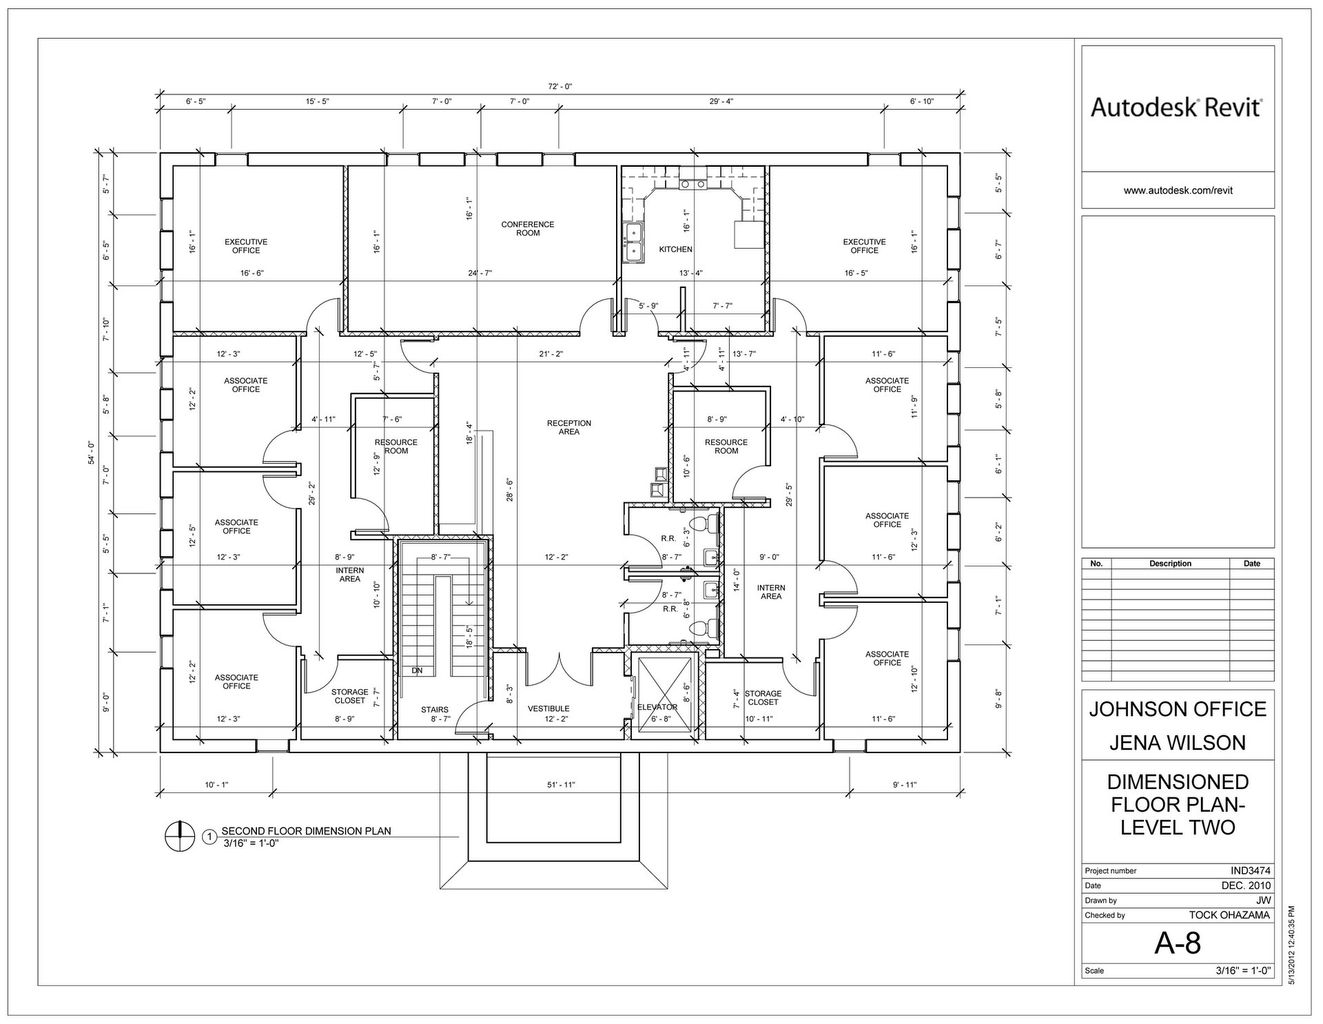 jena lyn wilson wix com dimensioning floor plans construction drawings